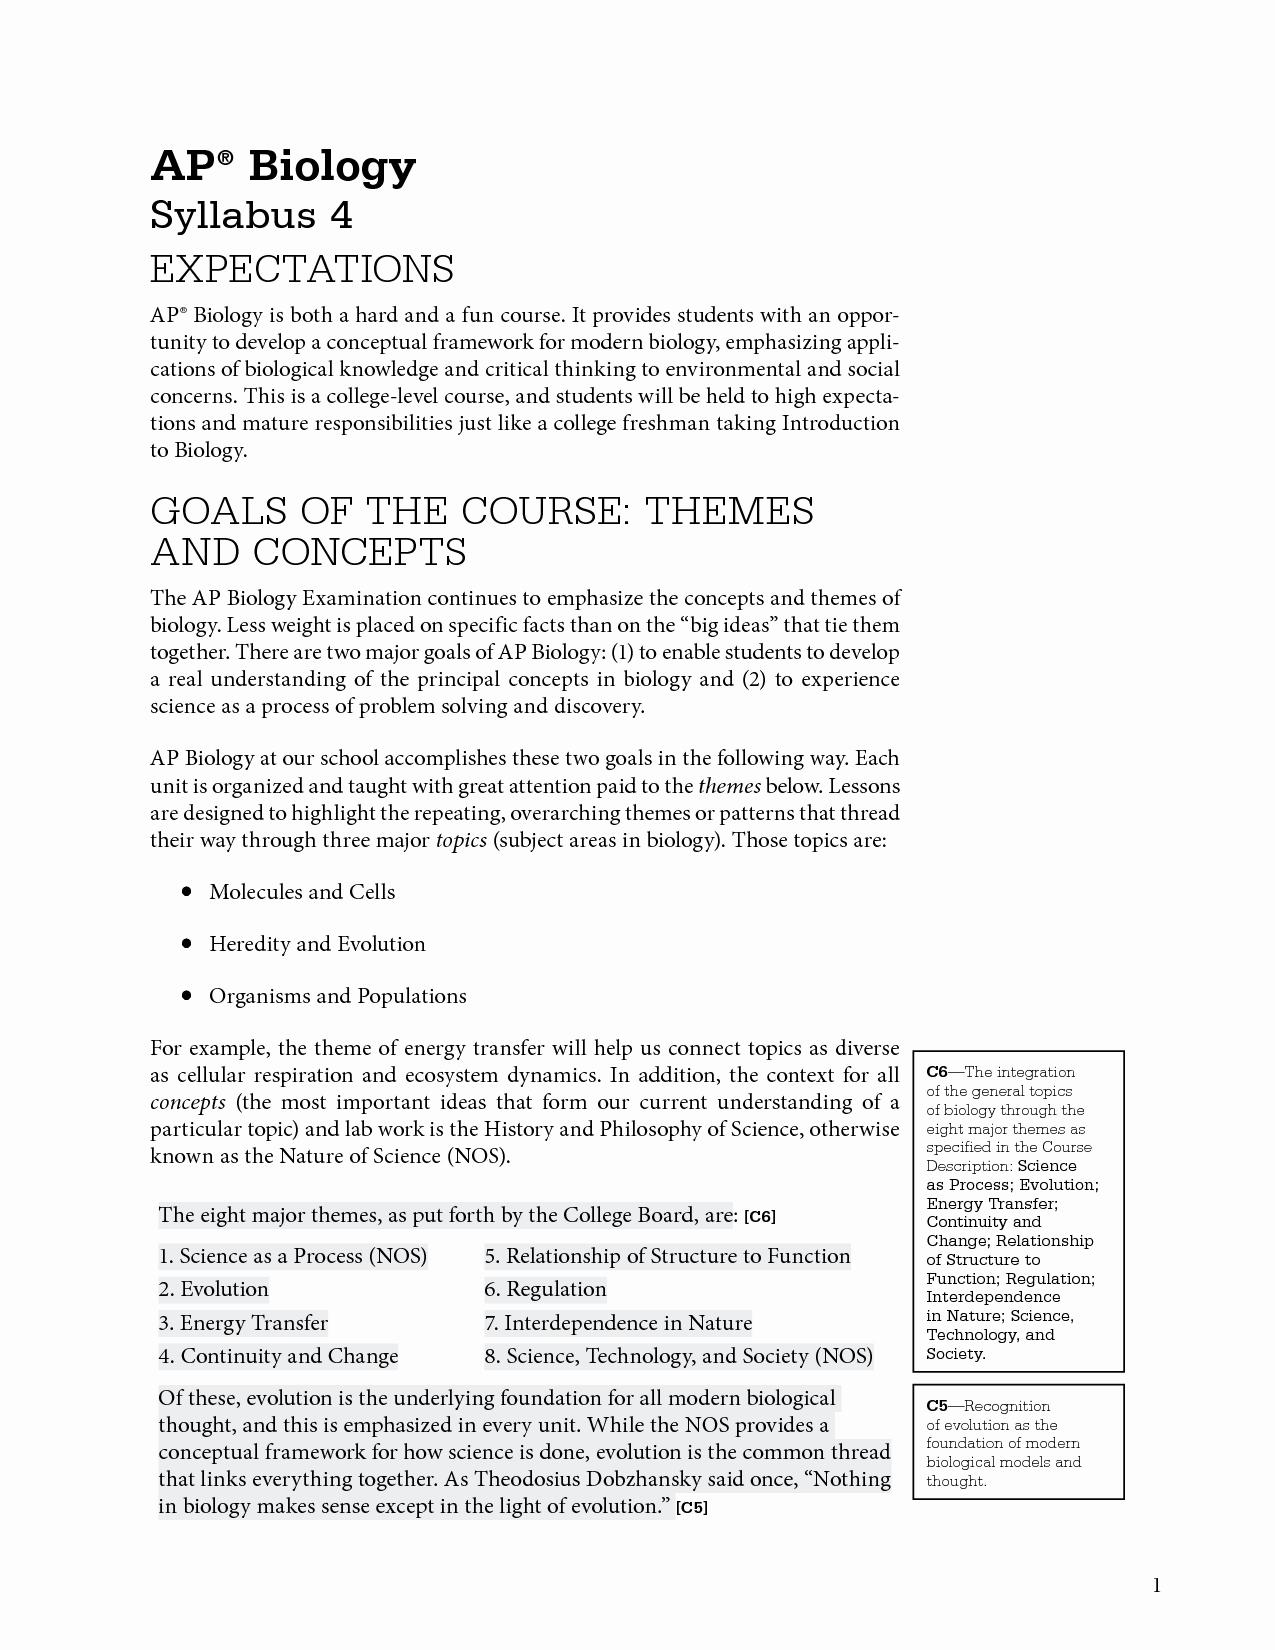 50 Meiosis Matching Worksheet Answer Key